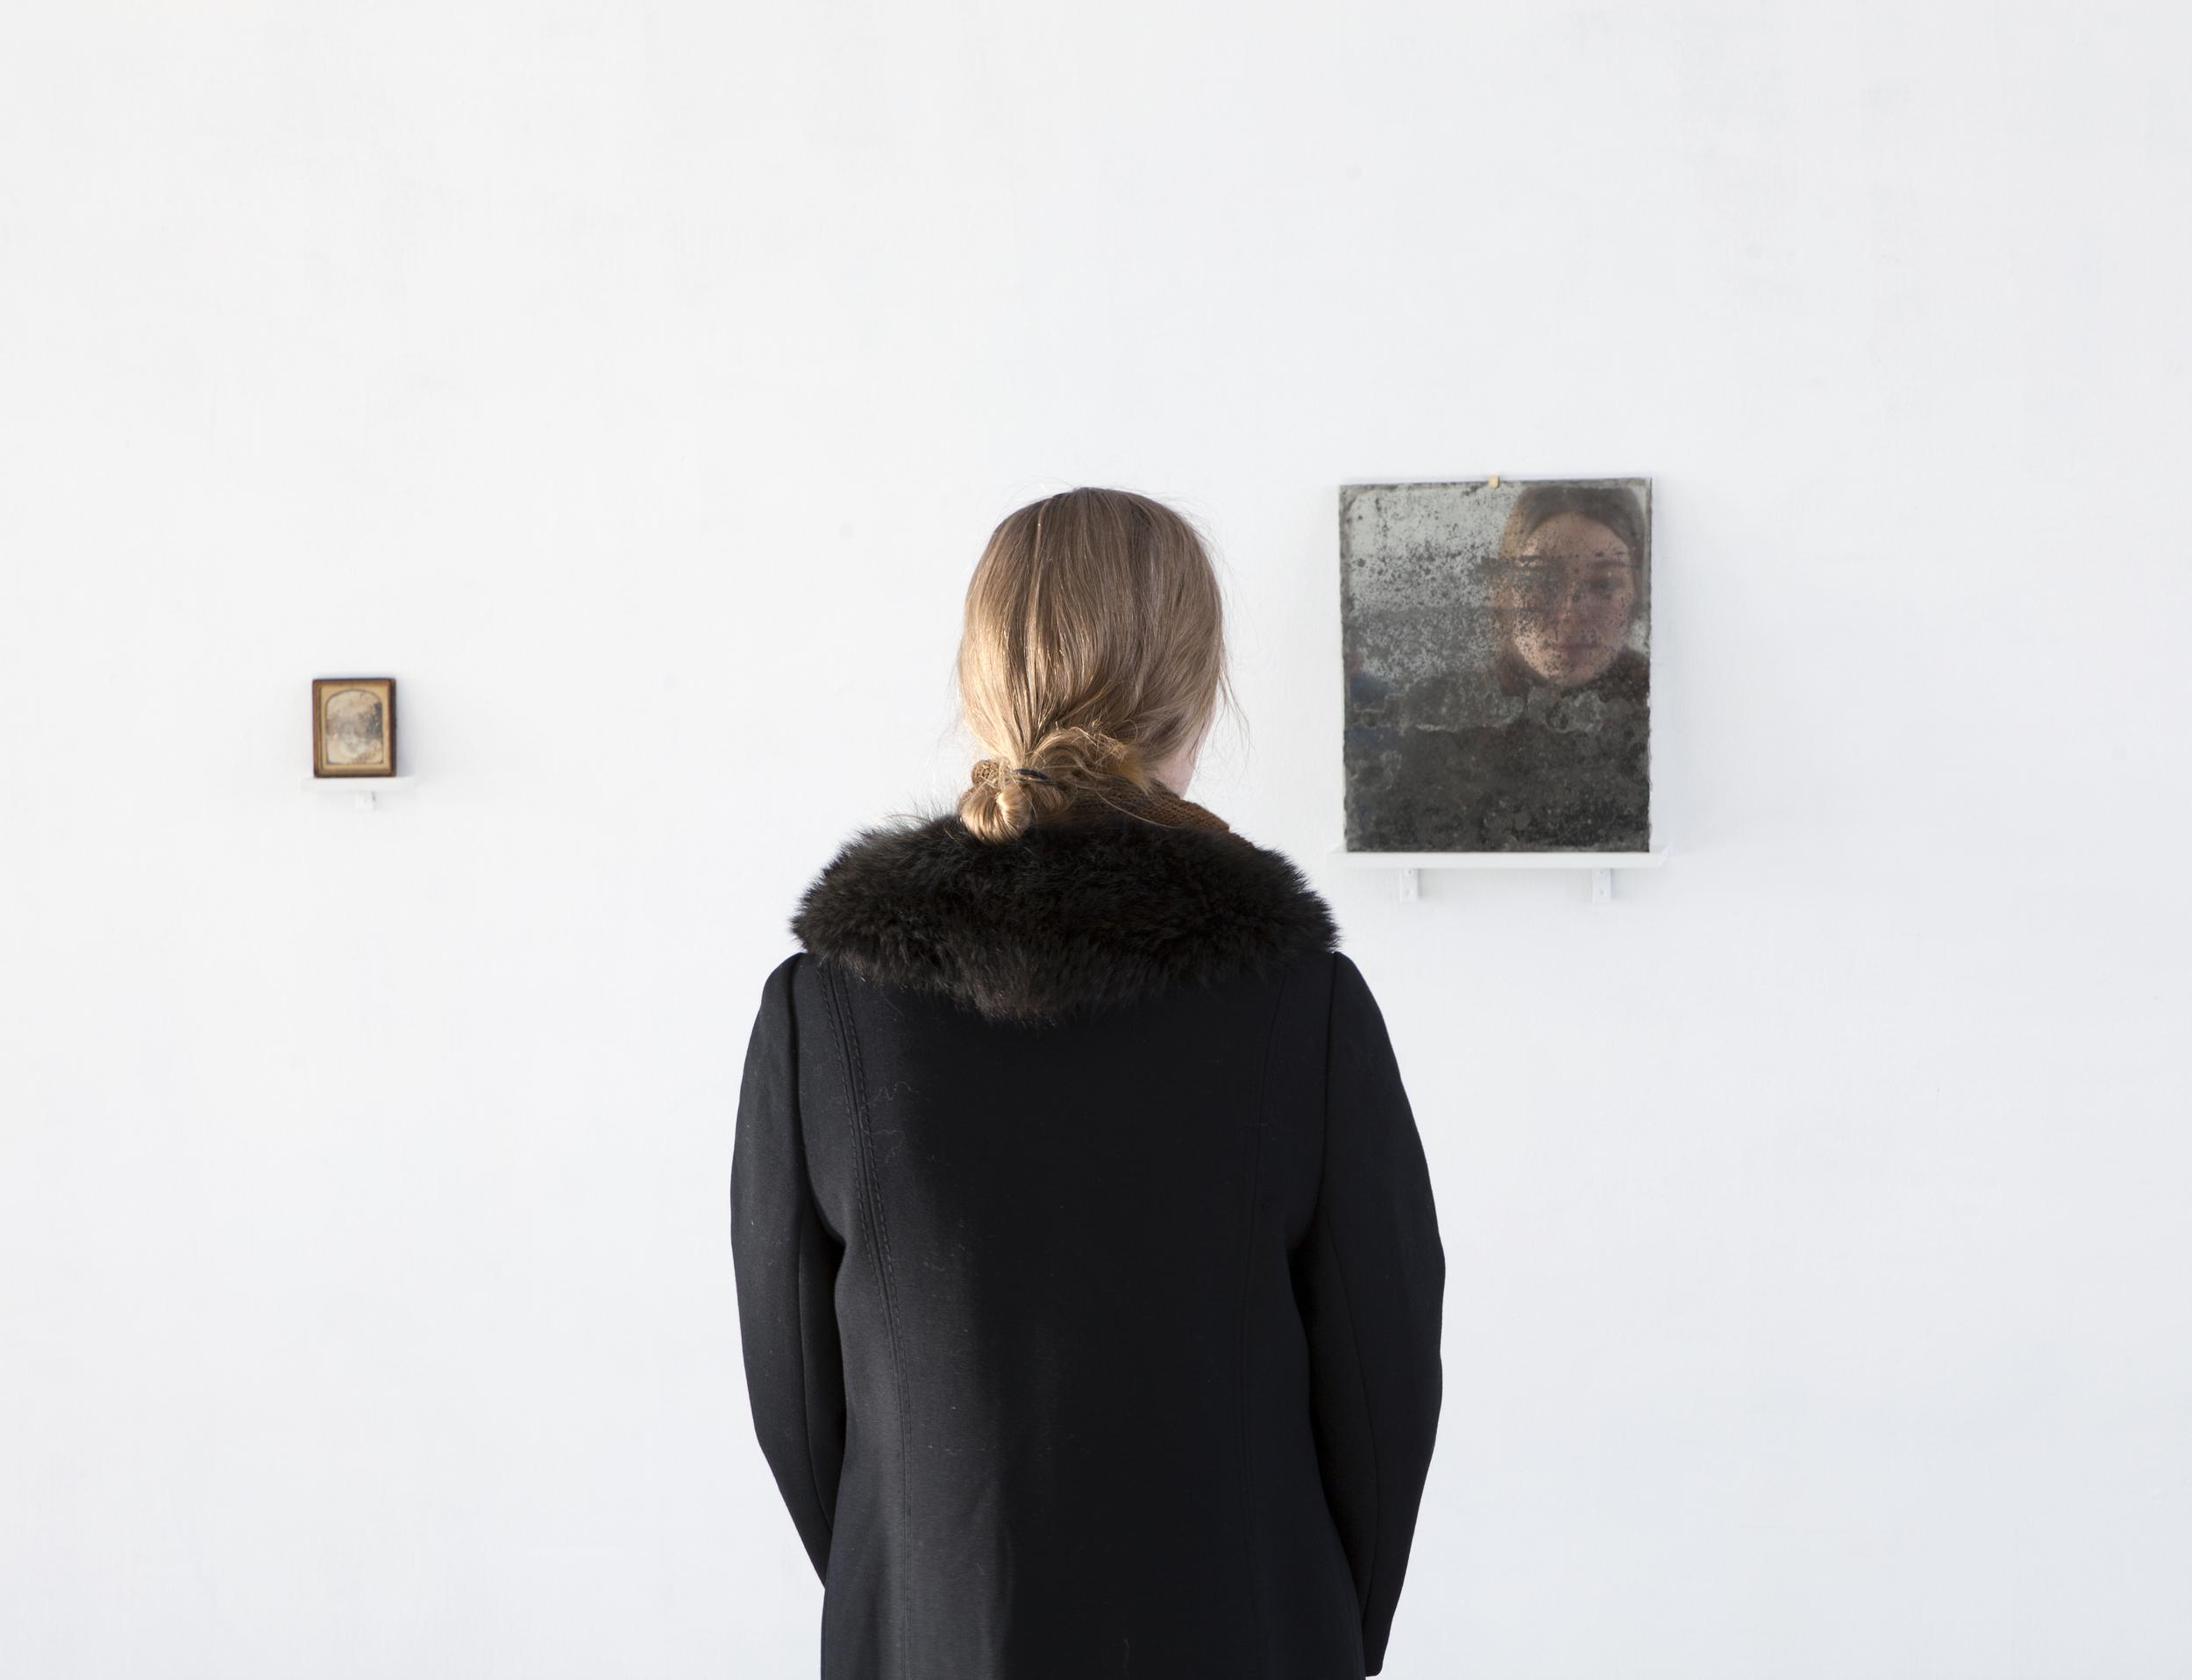 Tanja Koljonen,  What We See We Remember I    (2015)   ,   Daguerrotype, late 1800's, United States, 9,7 x 8cm,   What We See We Remember II  (2015), mirror 33 x 27cm